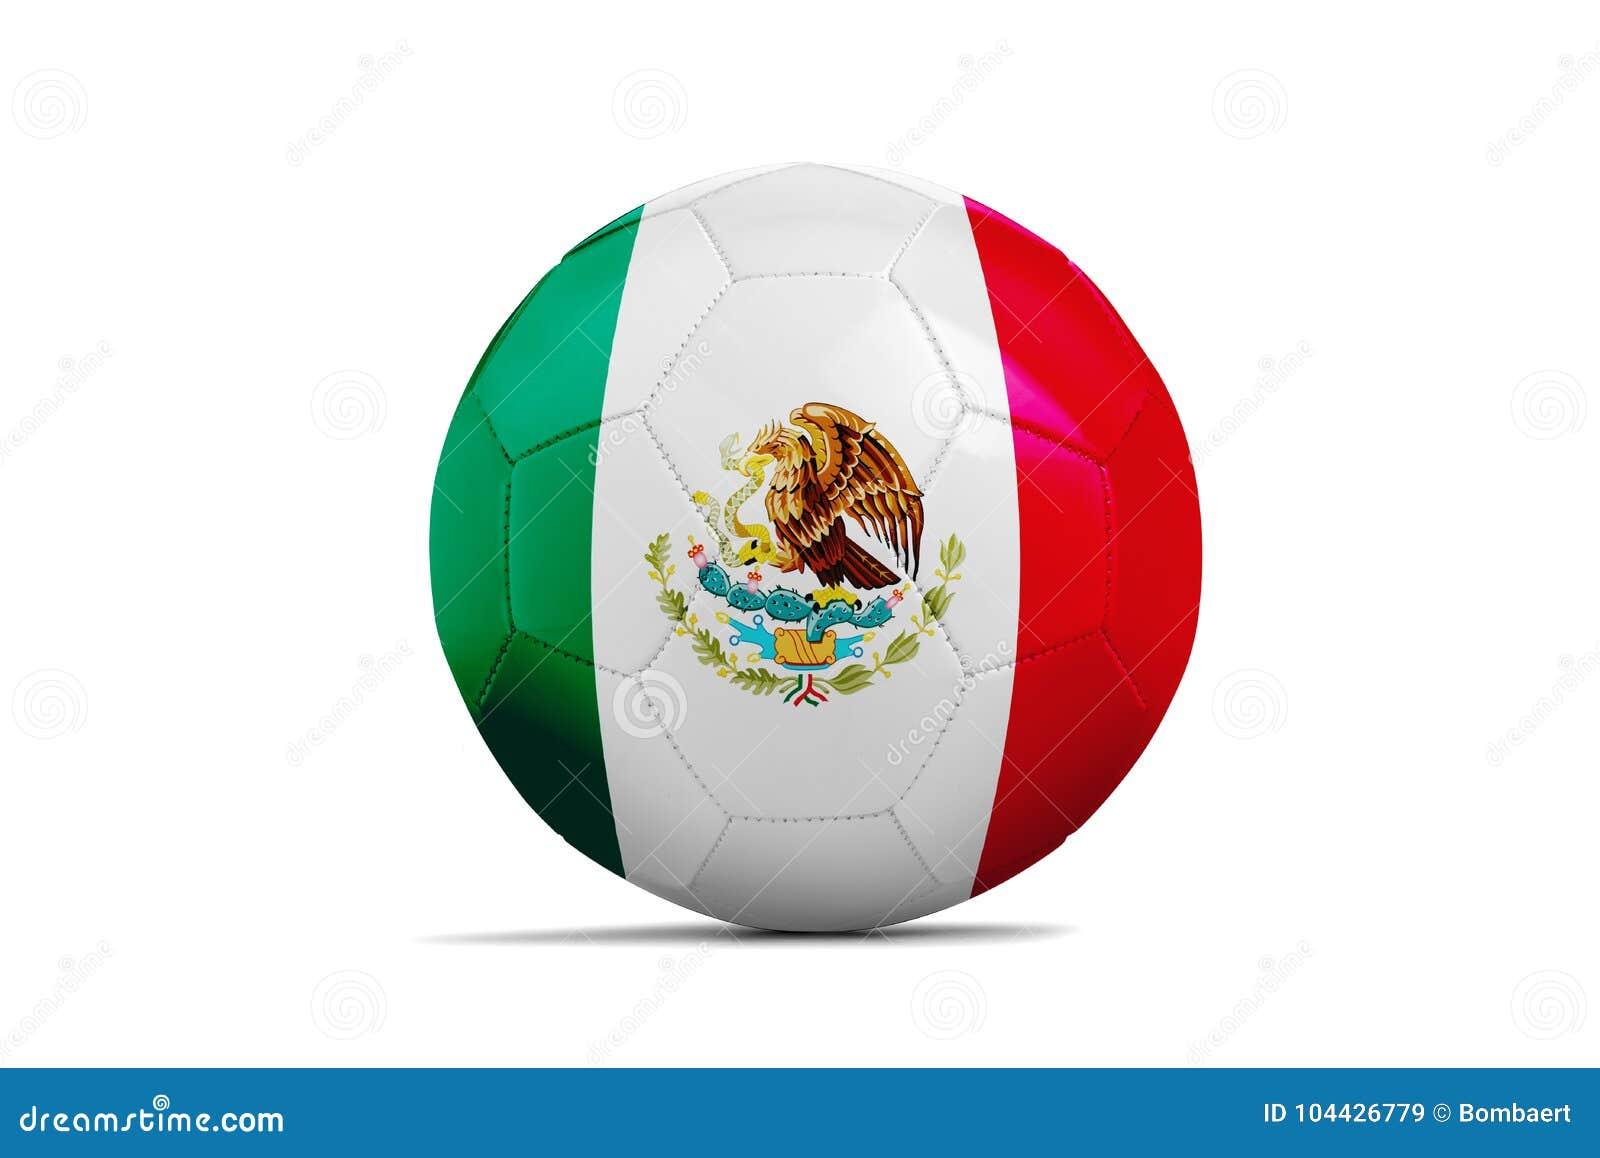 Ballon De Football Avec Le Drapeau Déquipe Russie 2018 Mexico